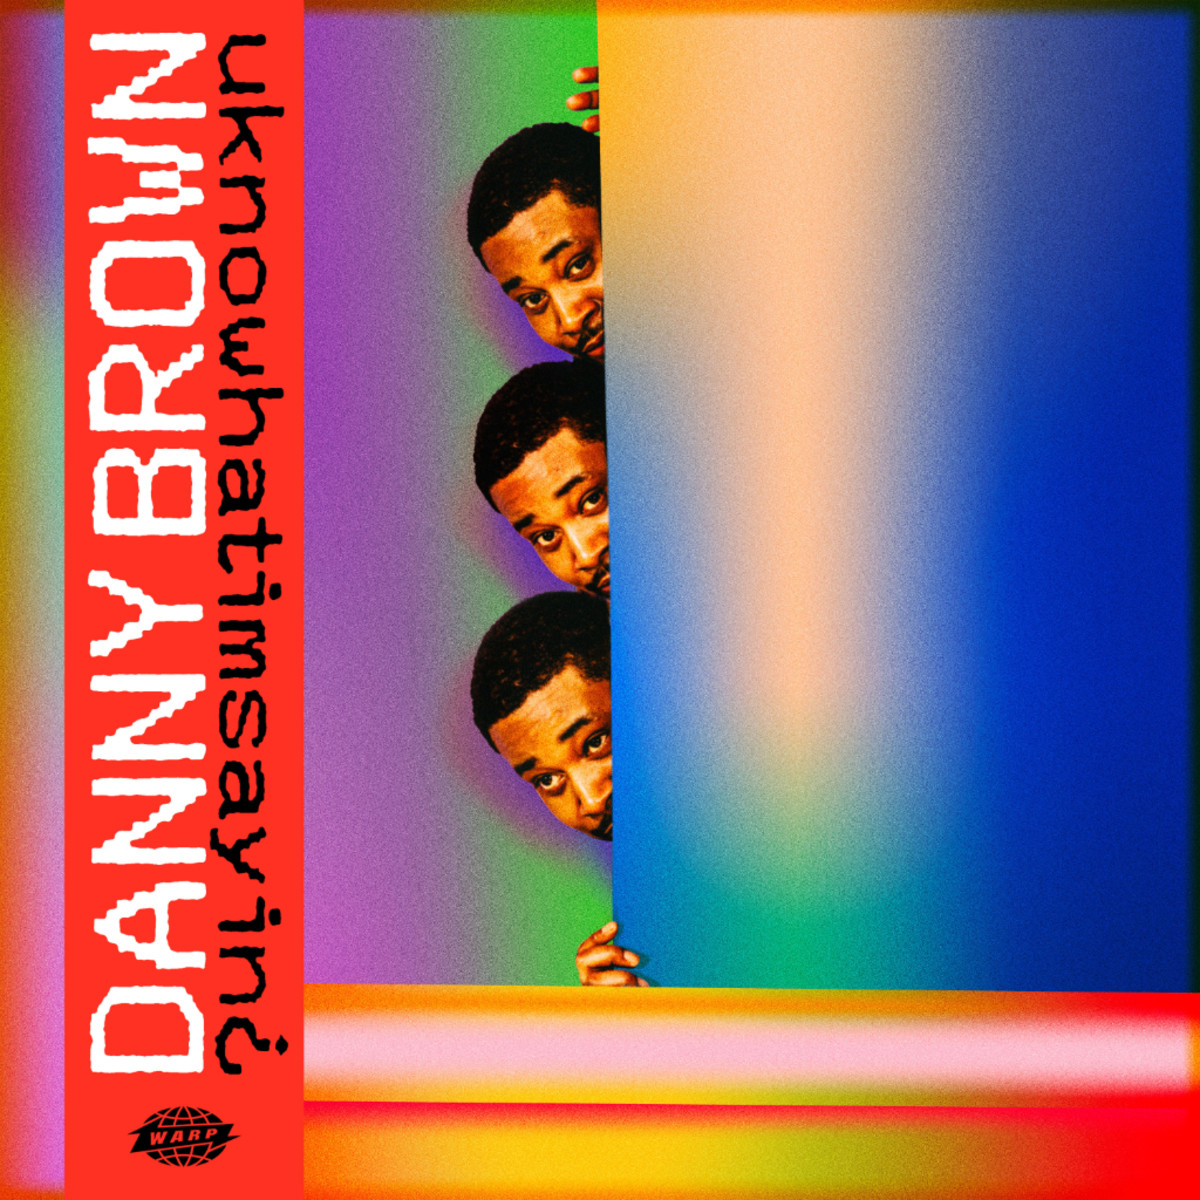 danny-brown-uknowhatimsayin-cover